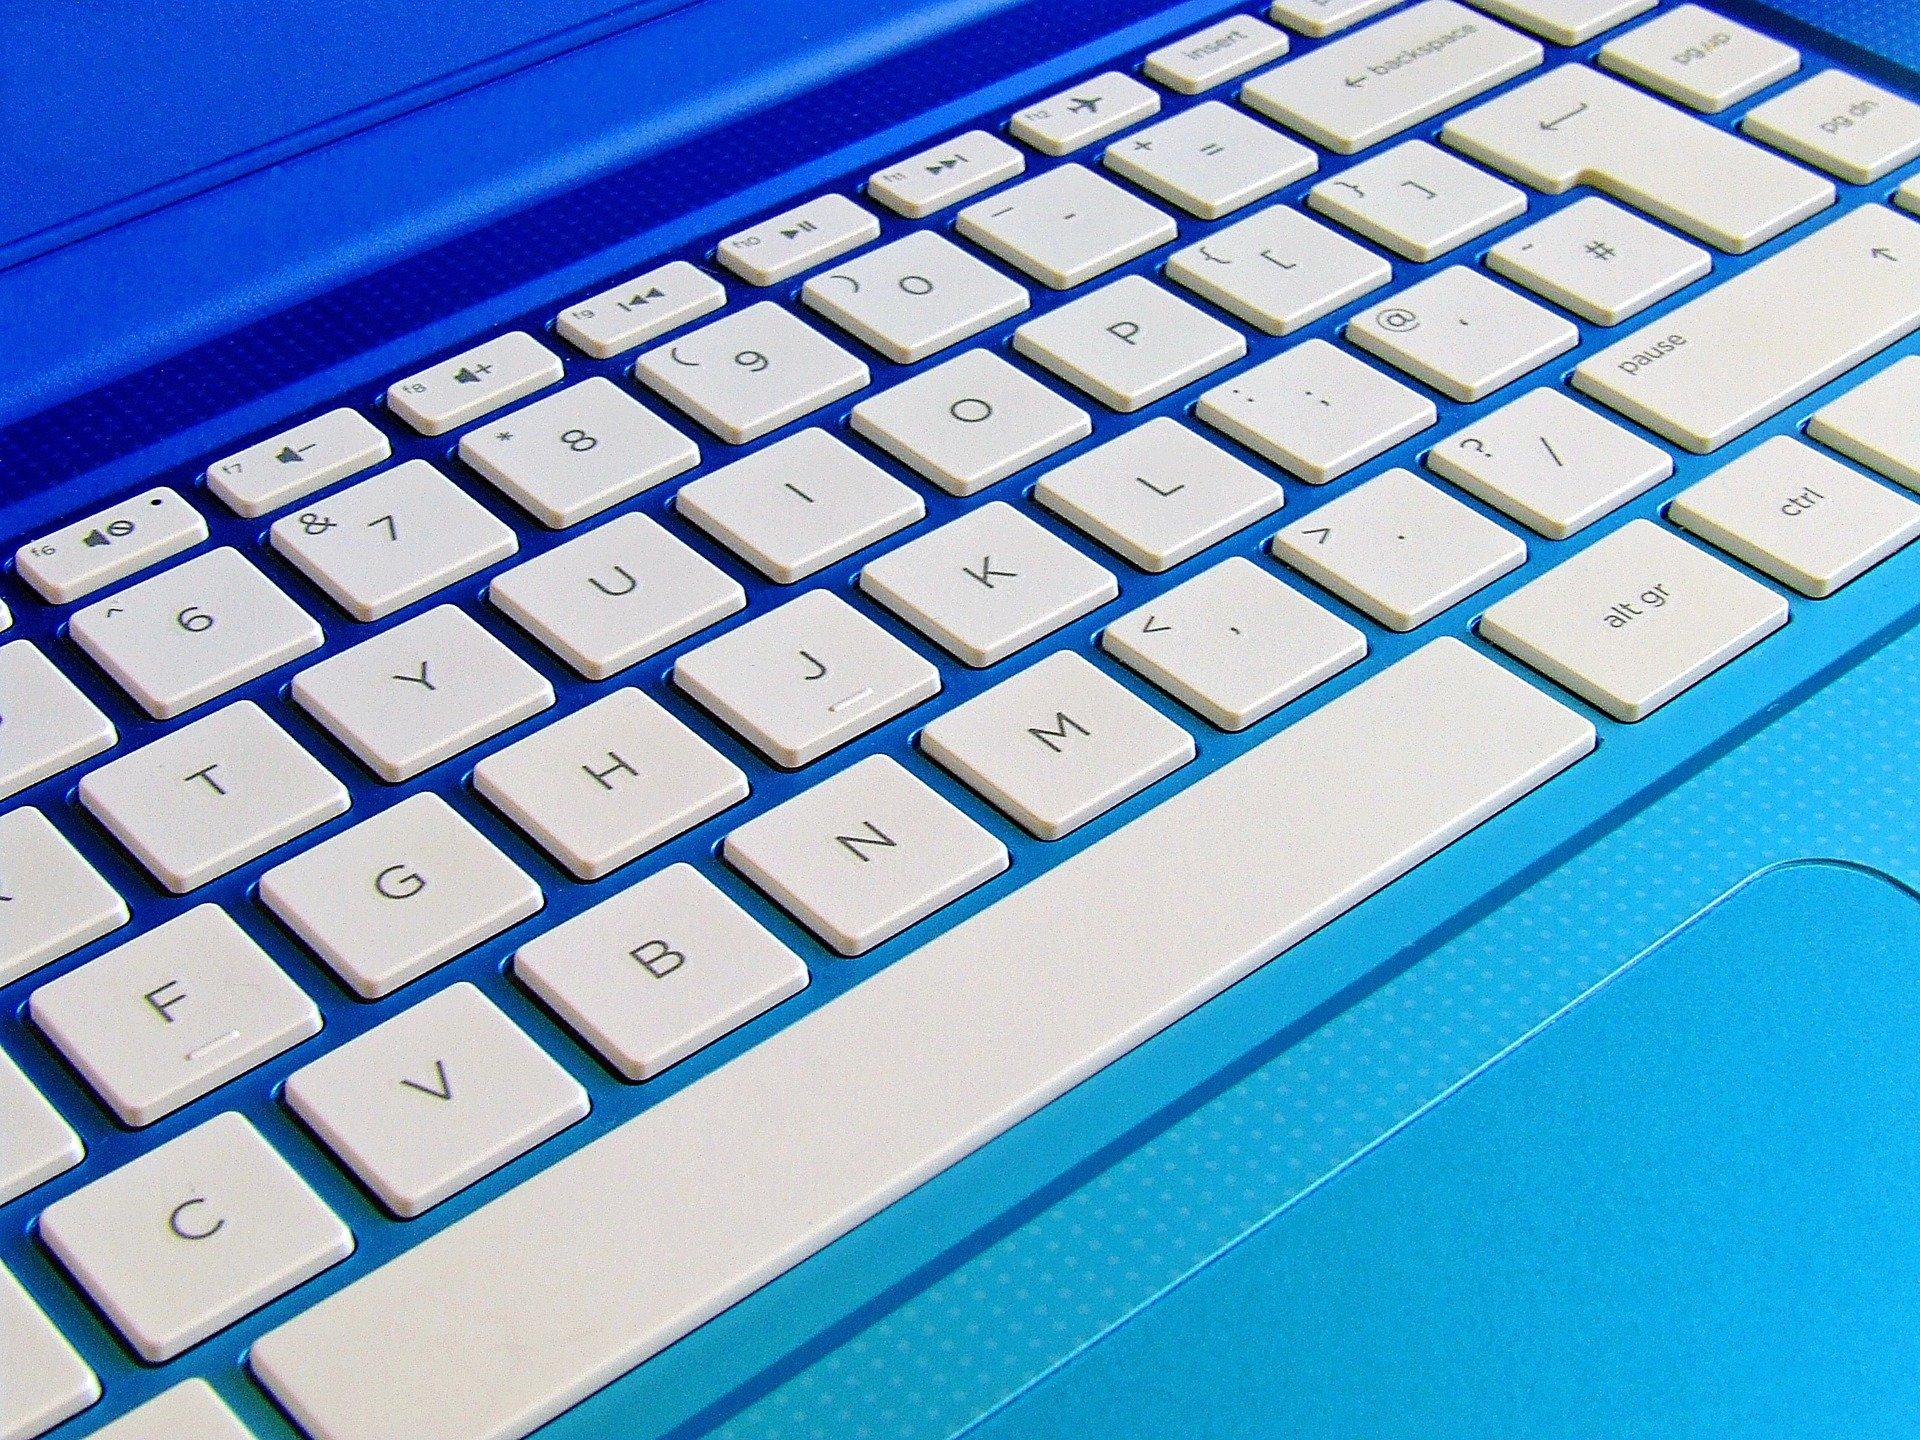 Microsoft Office Course: laptop keyboard